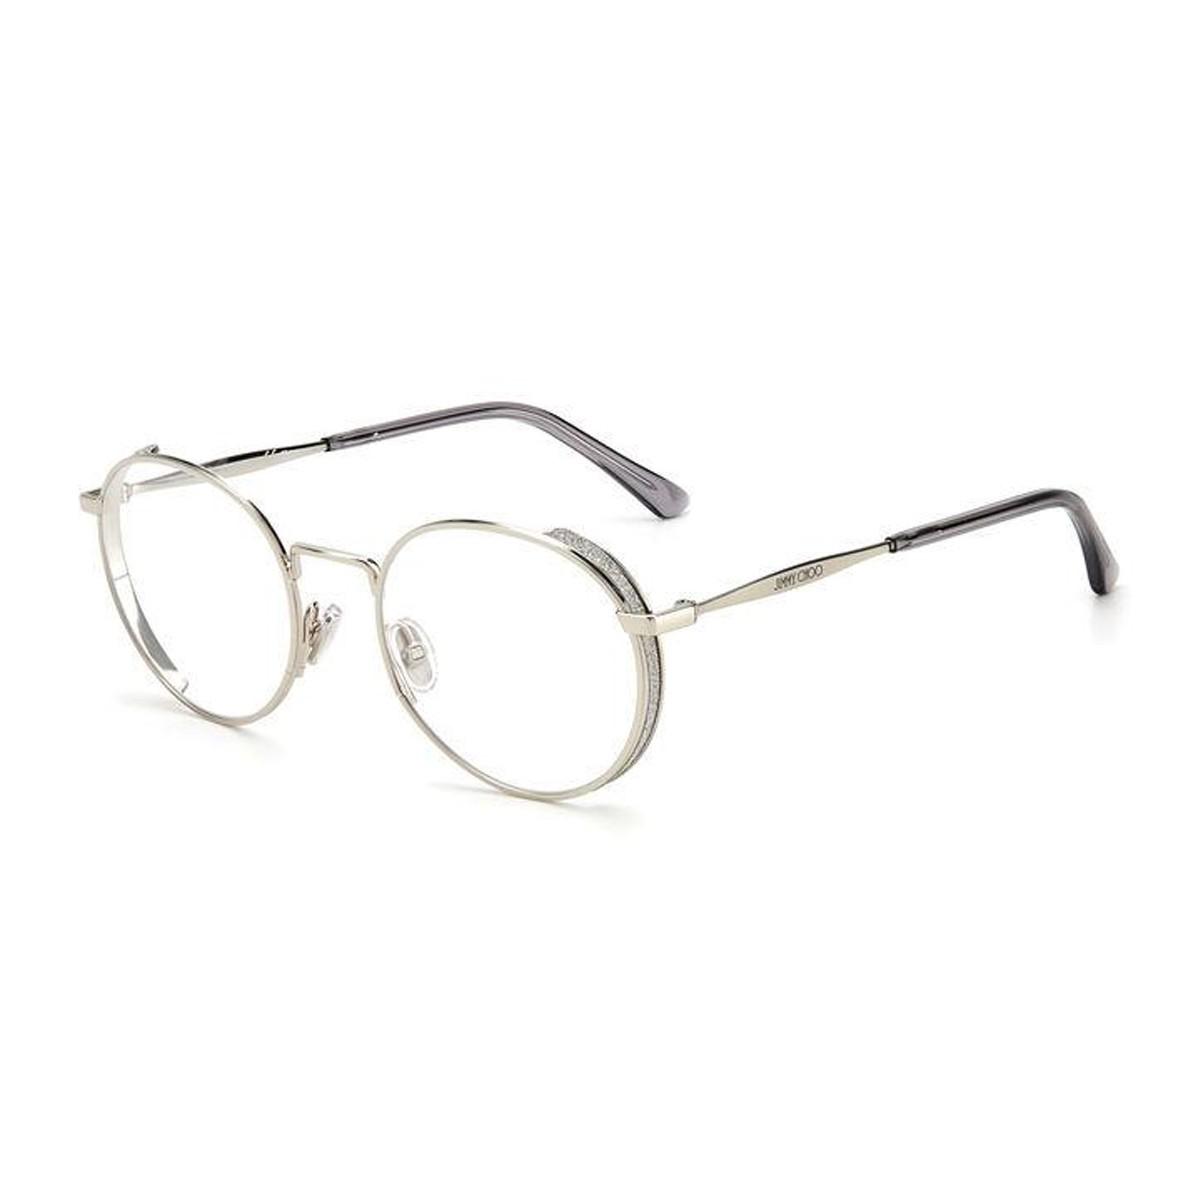 Jimmy Choo Jc301   Women's eyeglasses